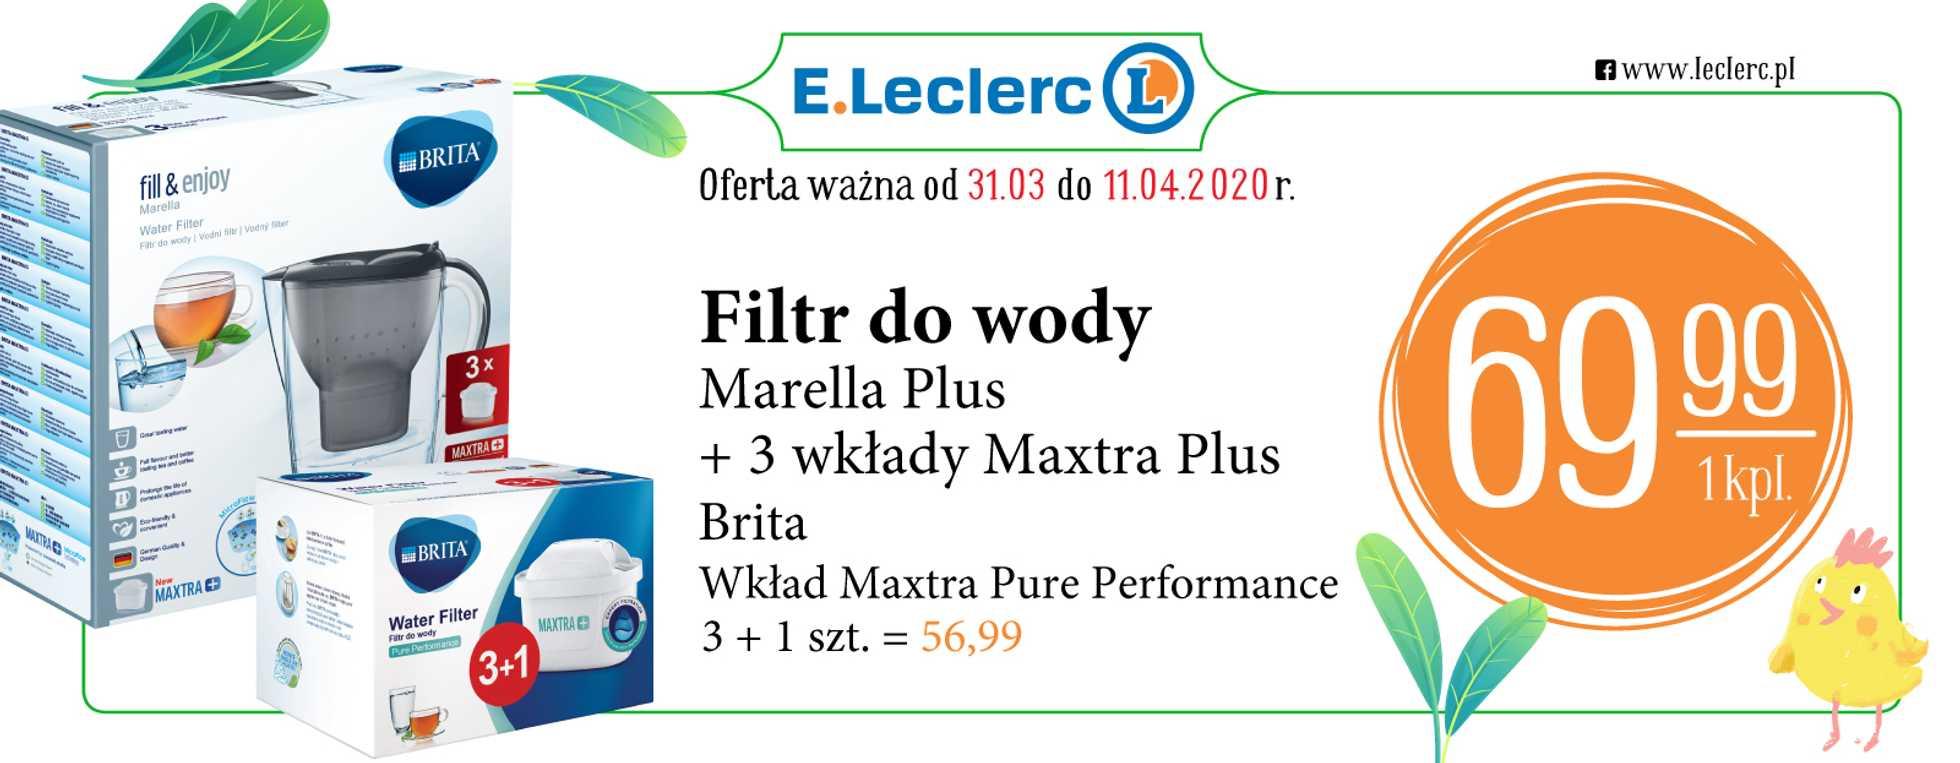 E.Leclerc - gazetka promocyjna ważna od 31.03.2020 do 11.04.2020 - strona 3.